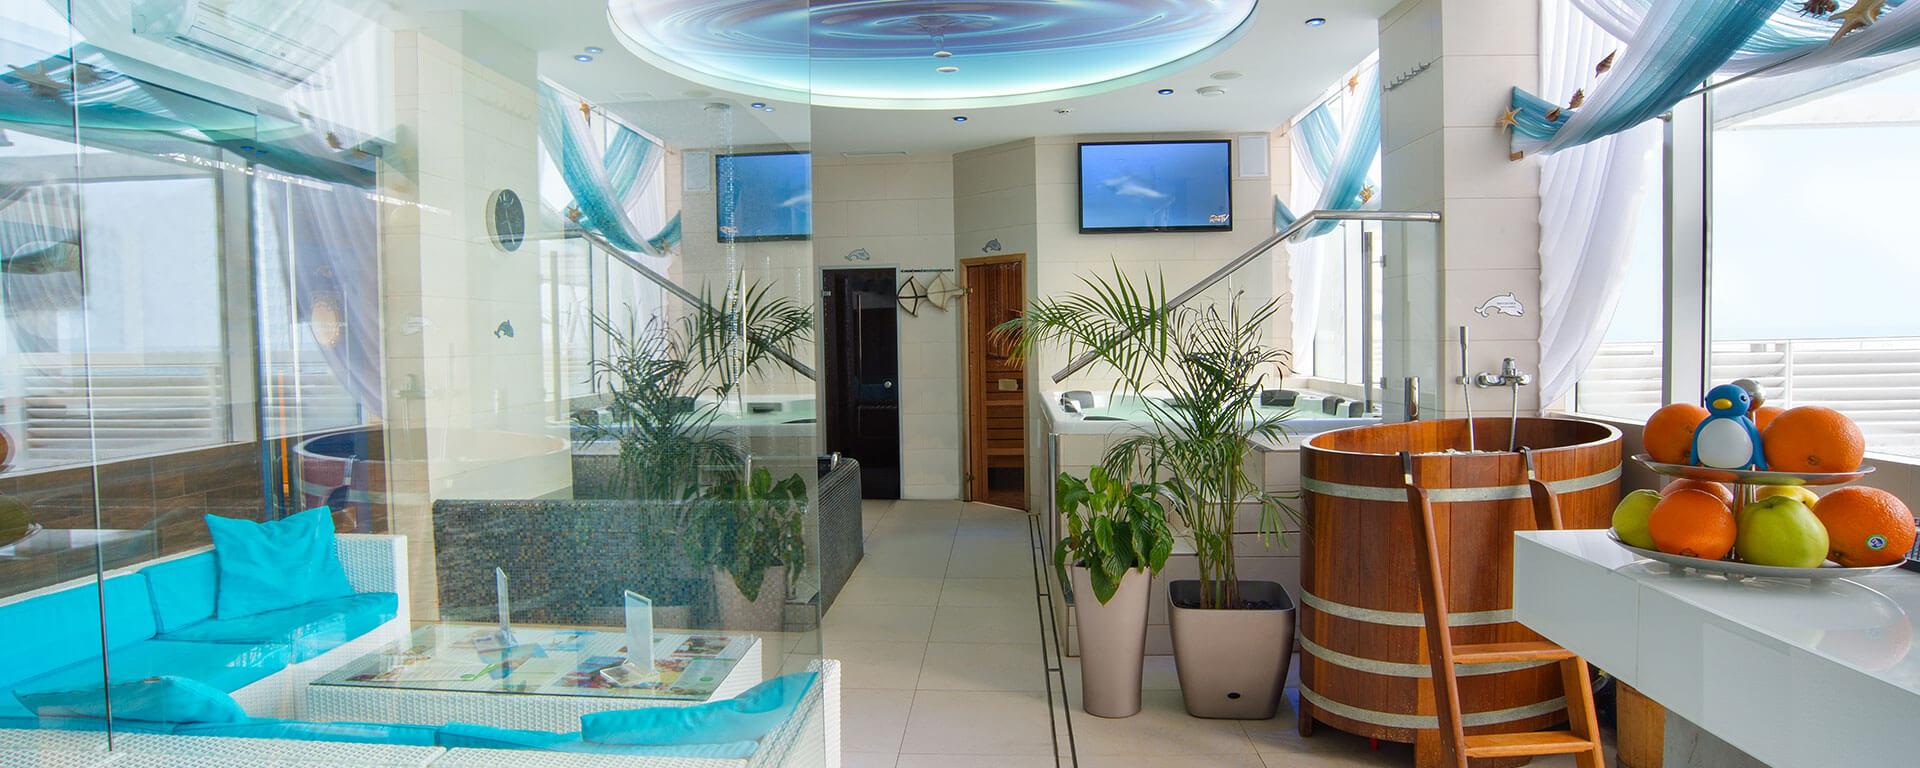 Бассейны - NEMO Resort & SPA в Одессе, фото № 1